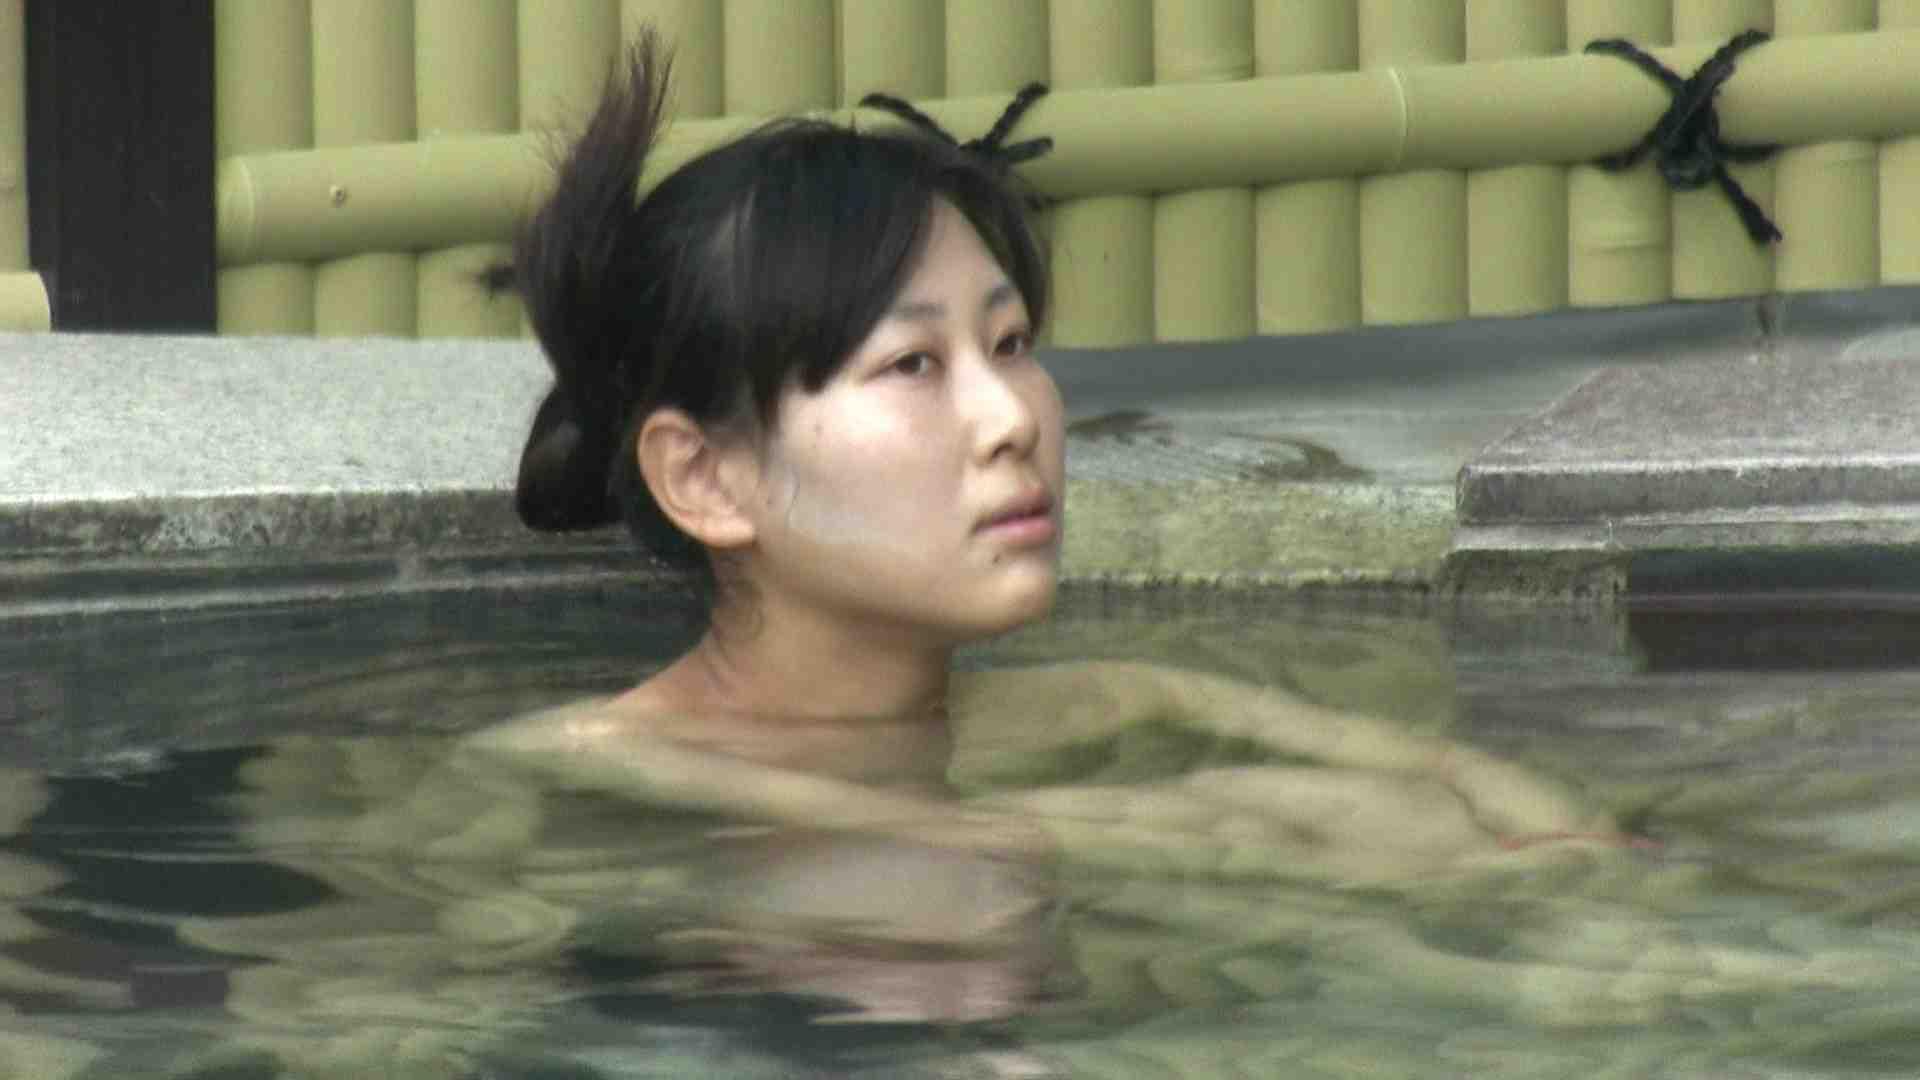 Aquaな露天風呂Vol.665 露天 アダルト動画キャプチャ 85枚 32